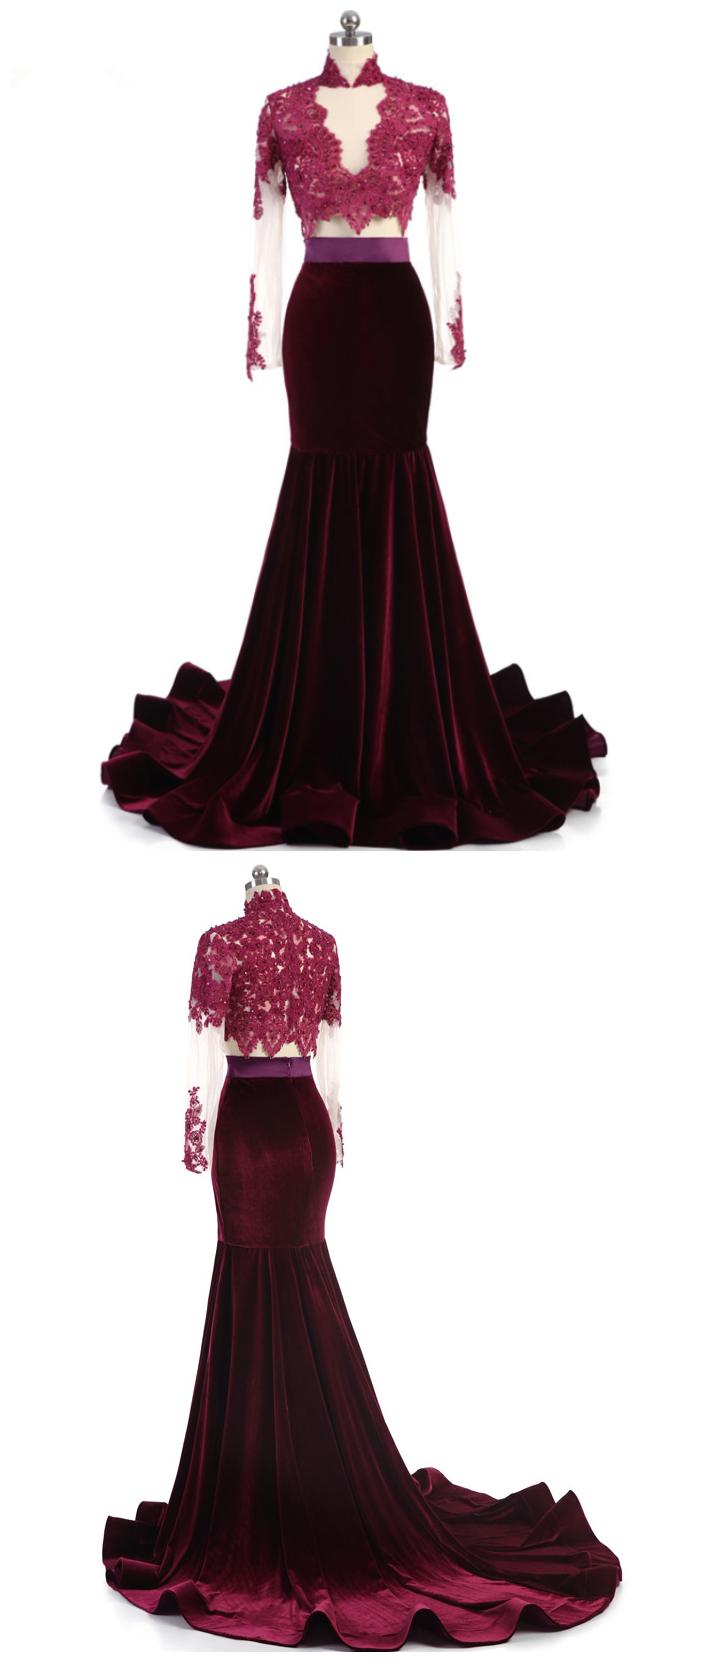 Party prom dress vestido de festa luxury beading highneck appliques